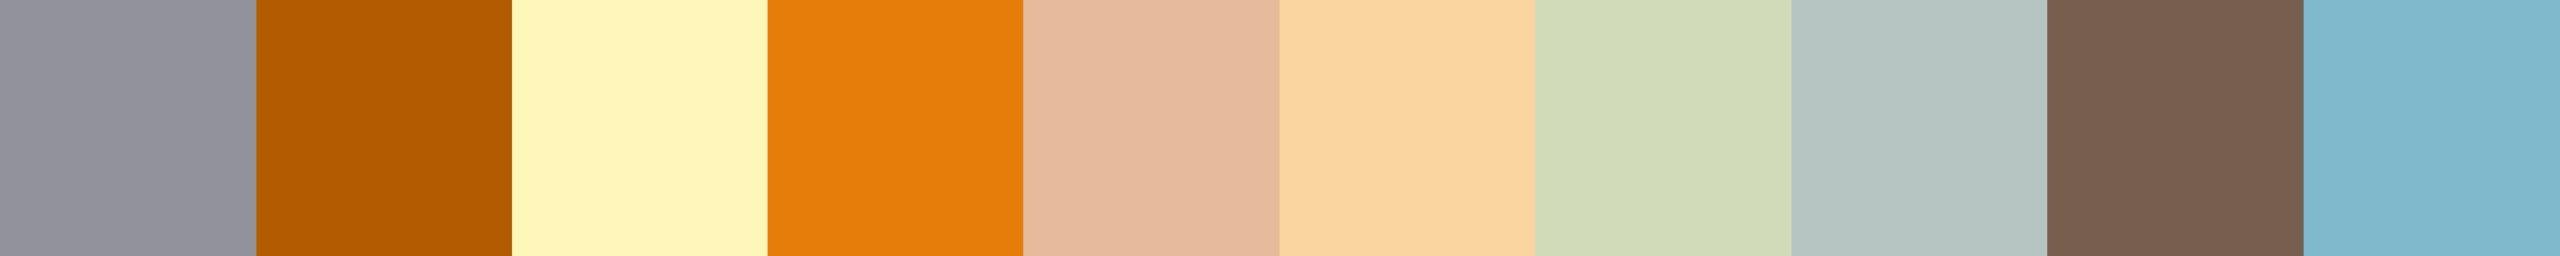 677 Kivdelia Color Palette